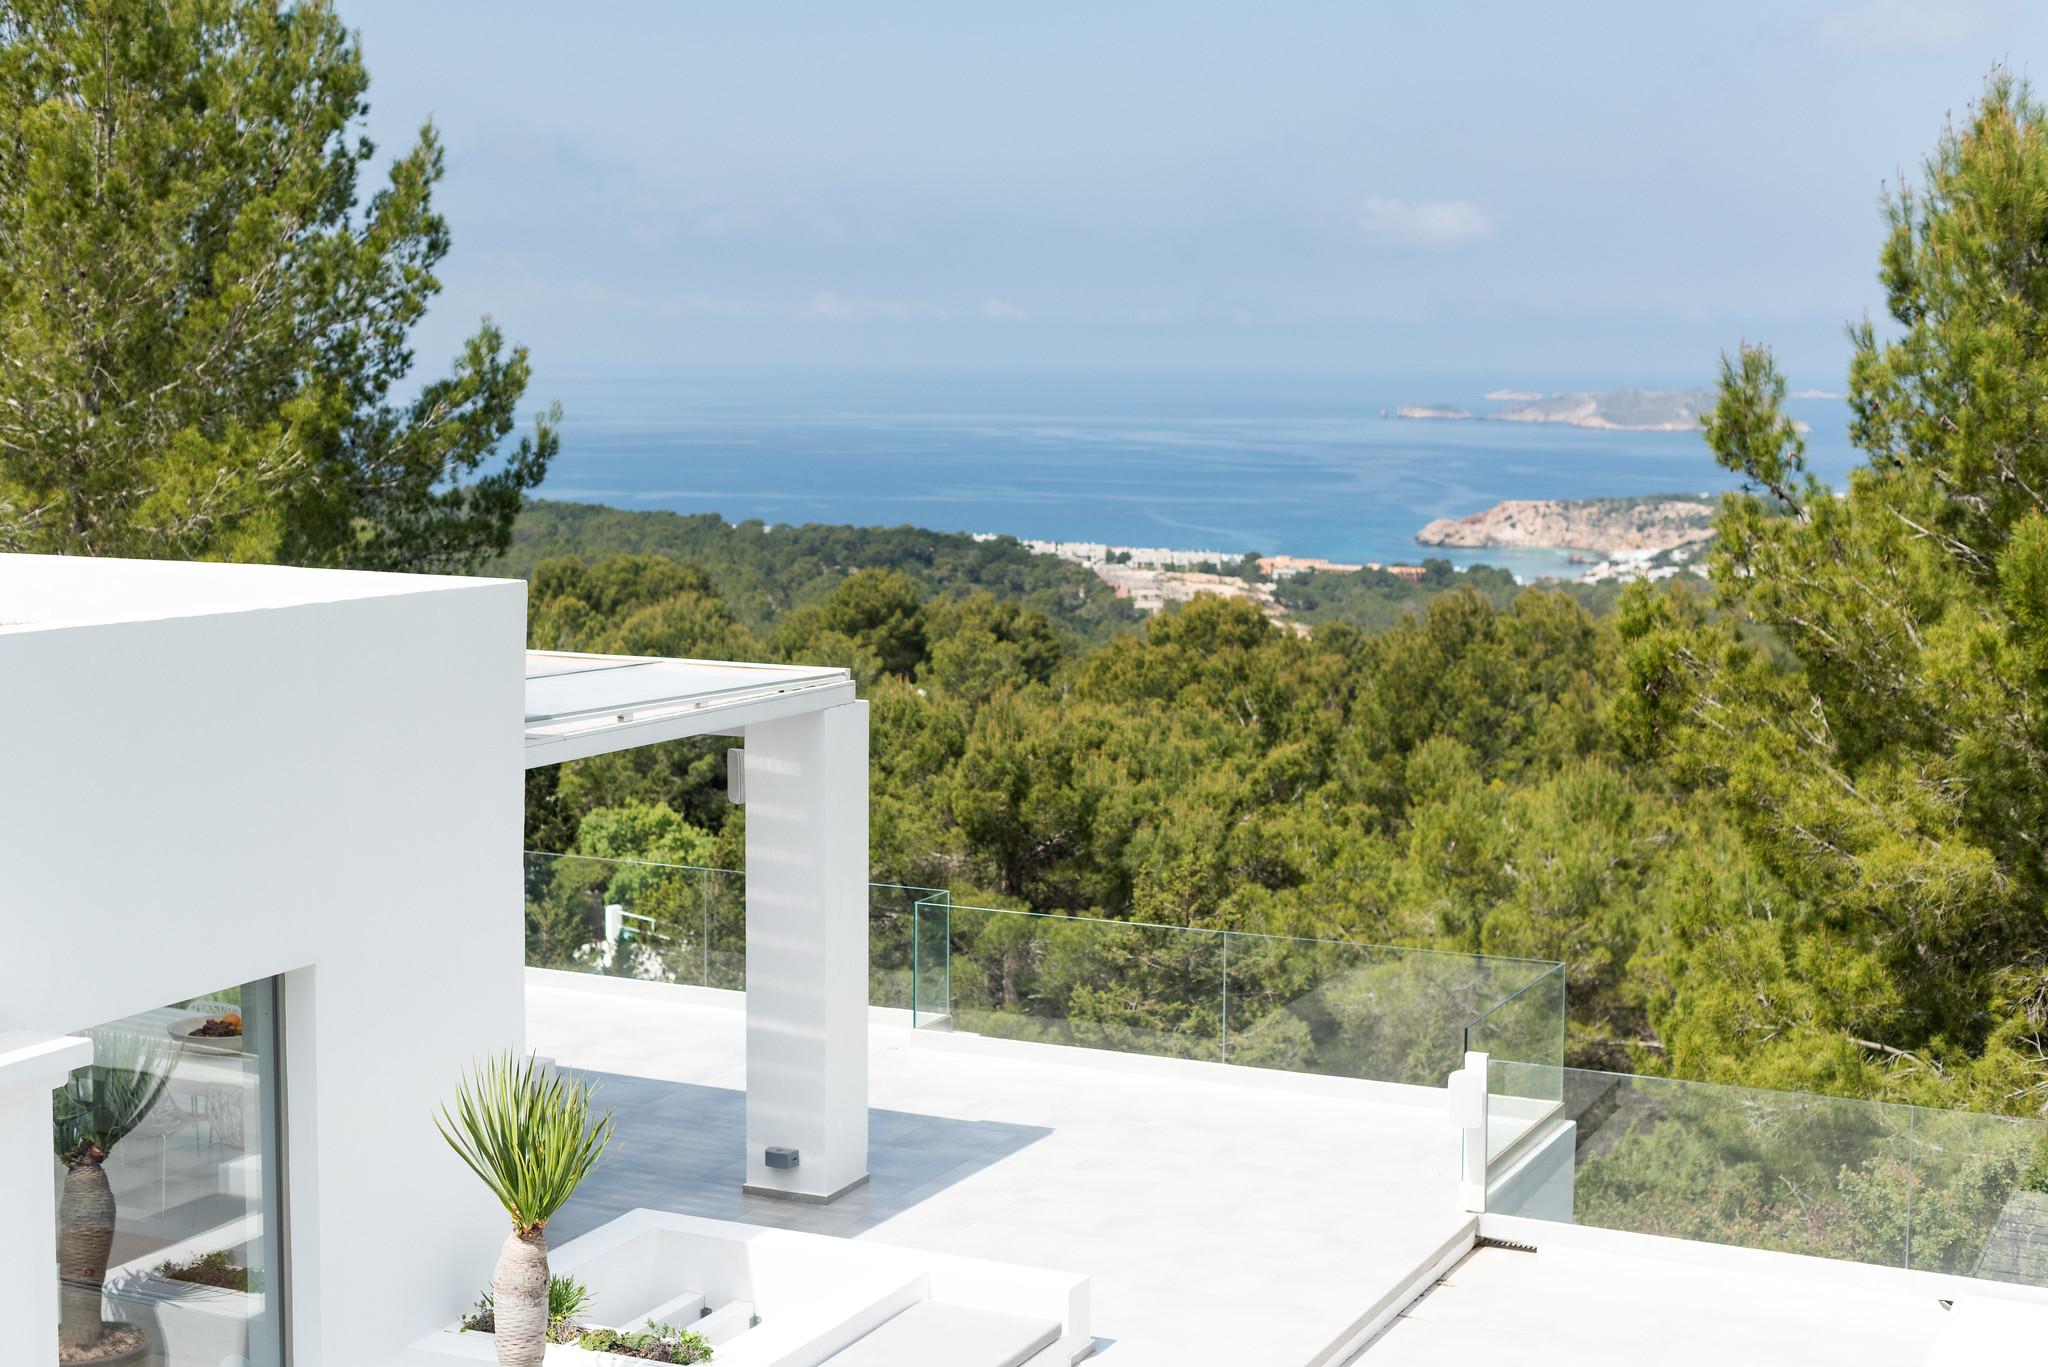 https://www.white-ibiza.com/wp-content/uploads/2020/05/white-ibiza-villas-can-dela-view-from-upper-terrace.jpg